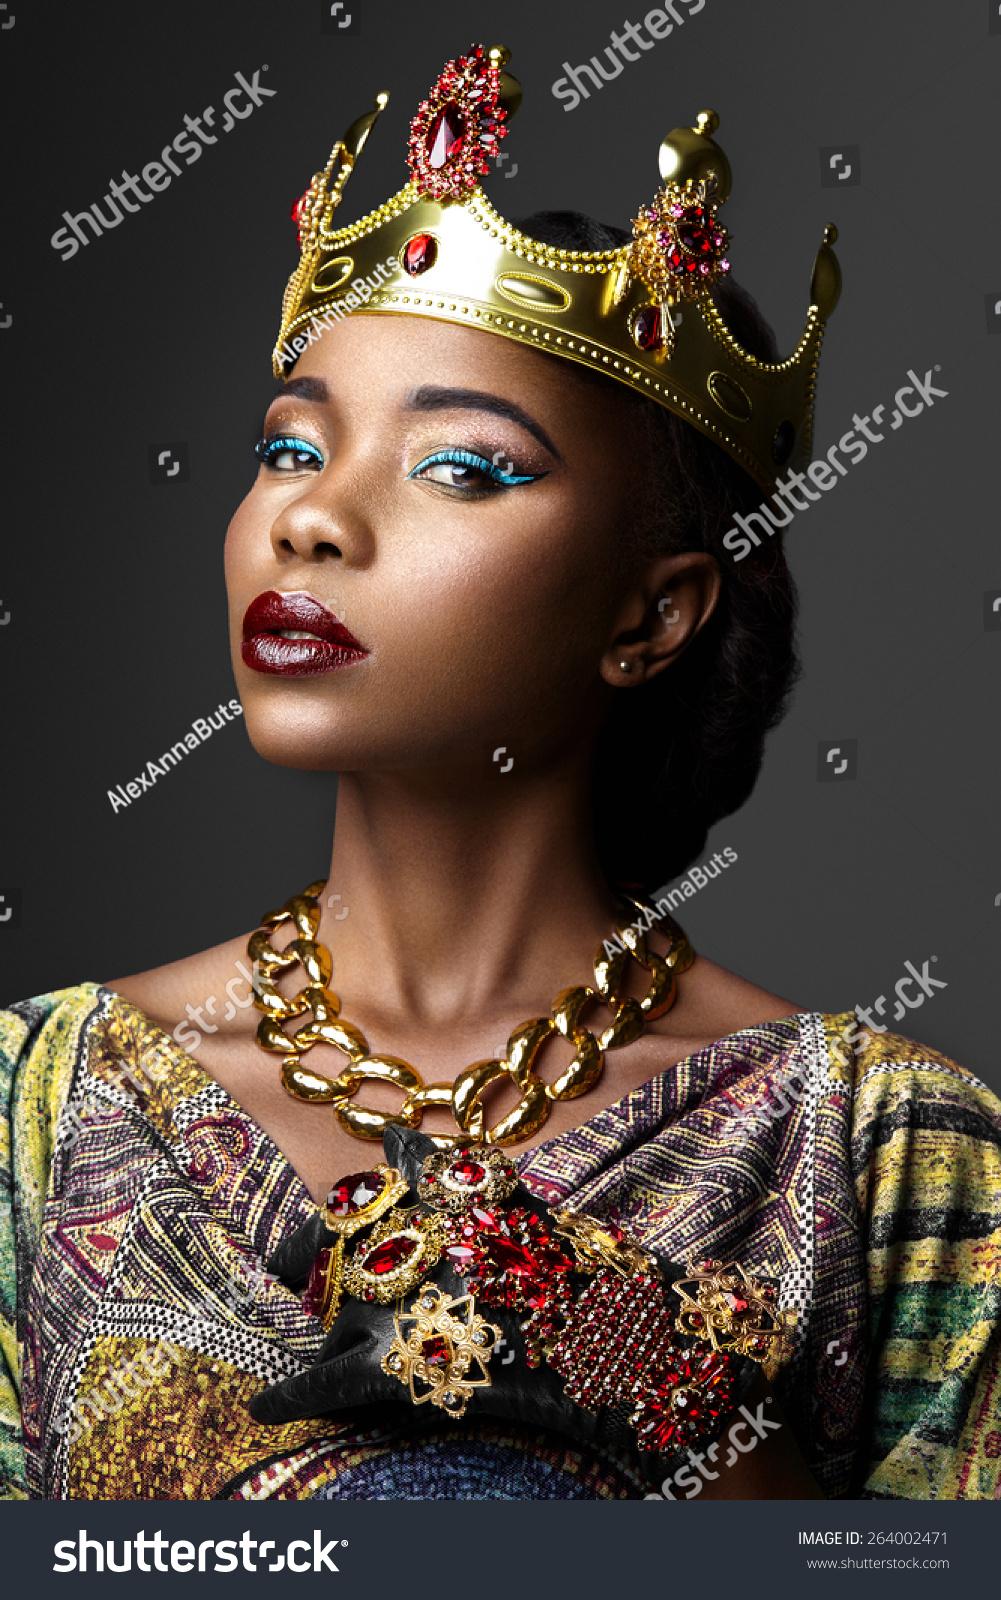 Crown princess black american amp mr marcus 7